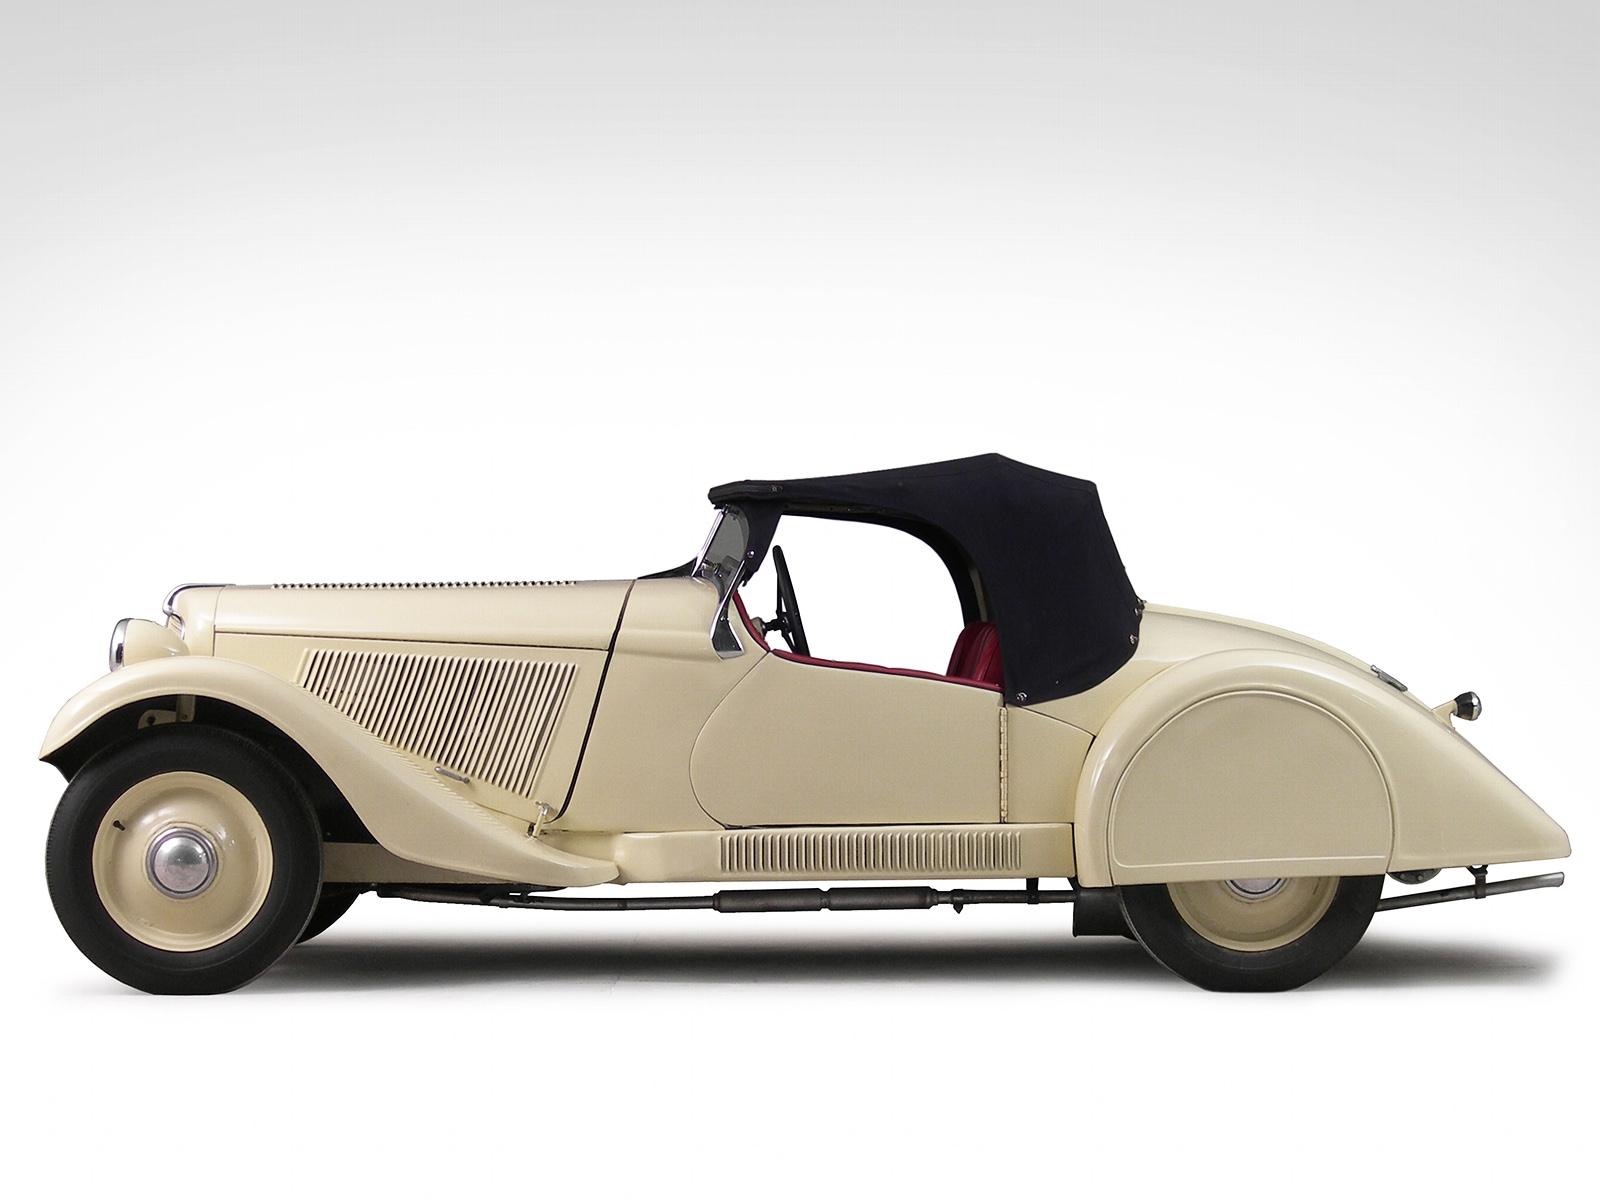 Wallpaper : side view, Vintage car, 1935, cars, retro, style, beige ...